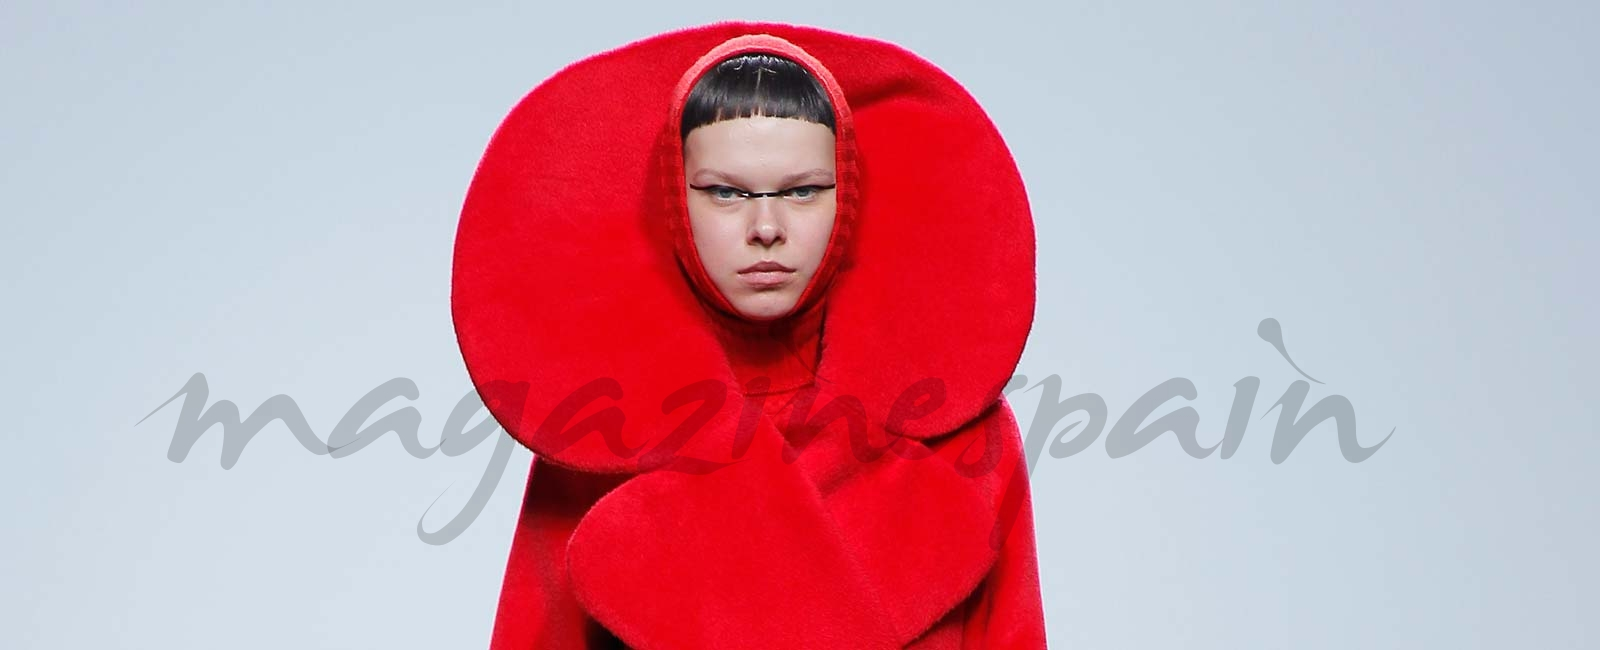 Mercedes Fashion Week Madrid: María Escoté Otoño Invierno 2018-2019